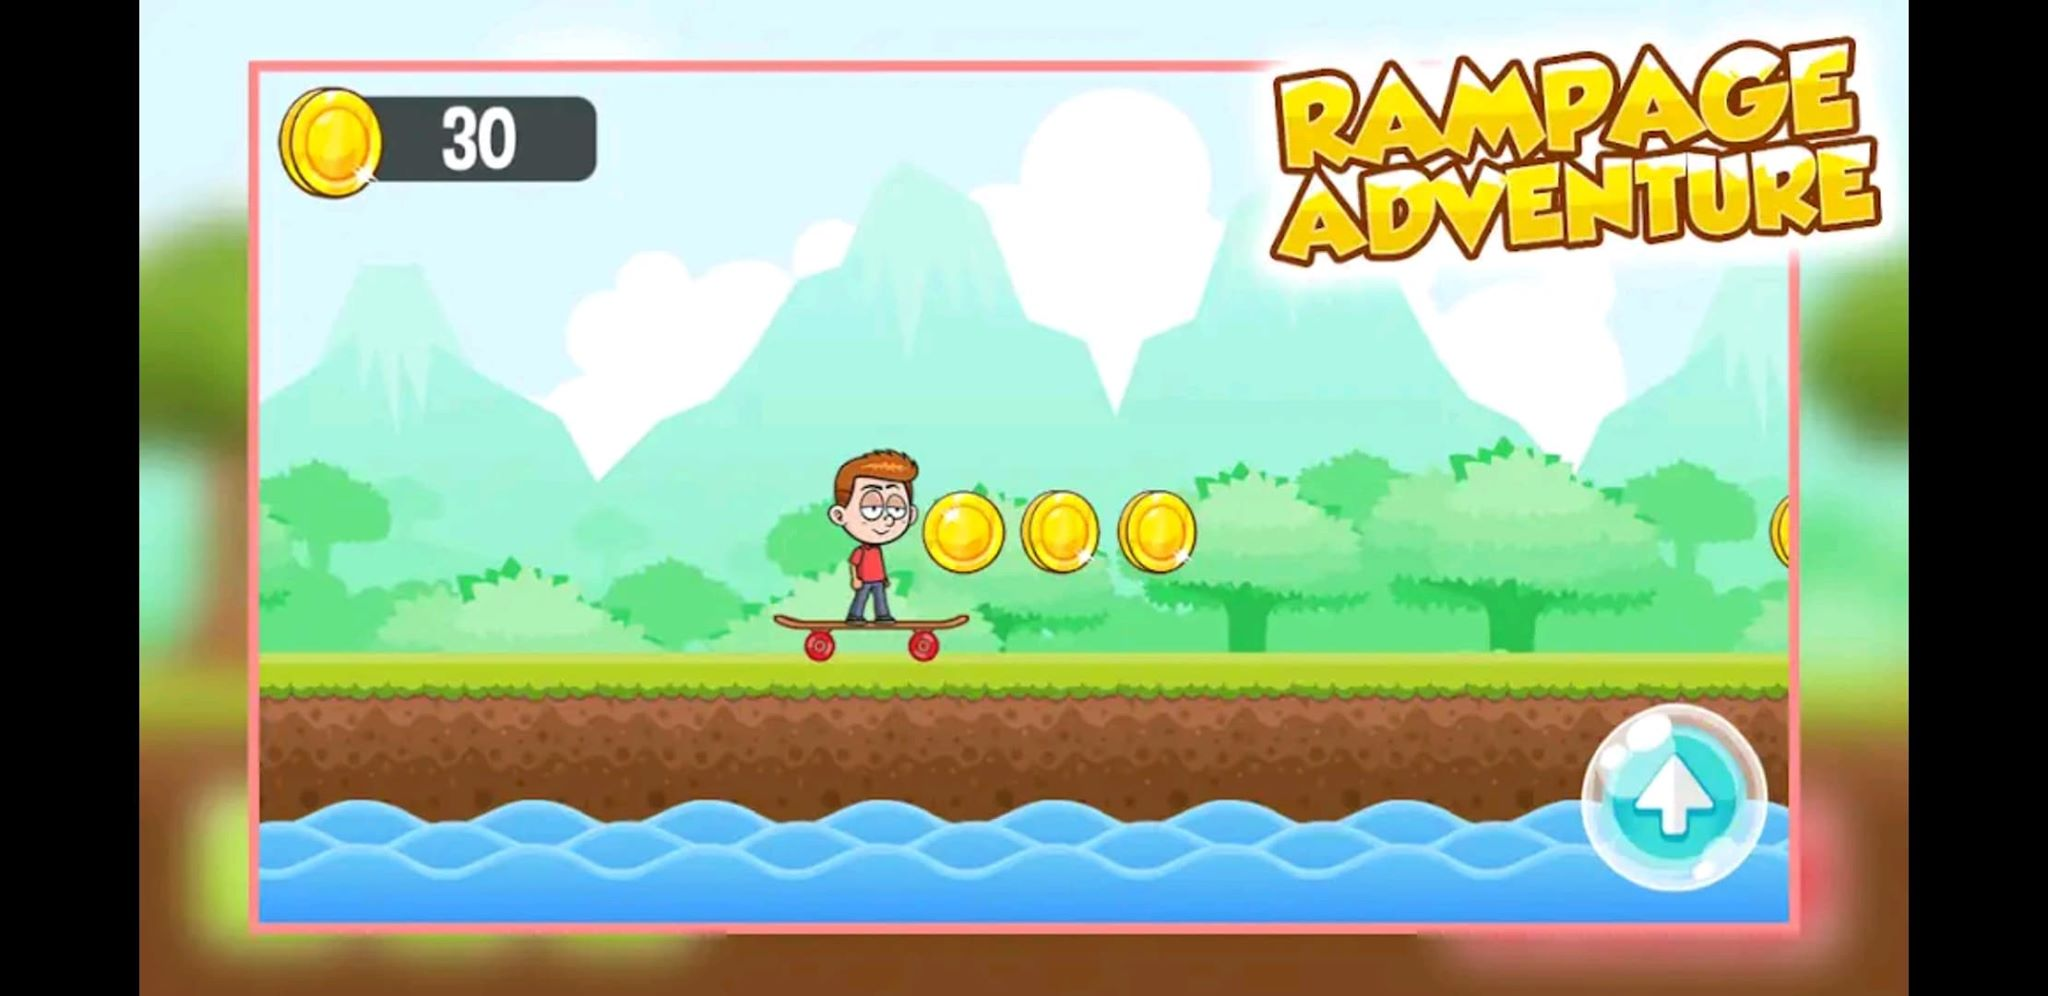 Rampage Adventure